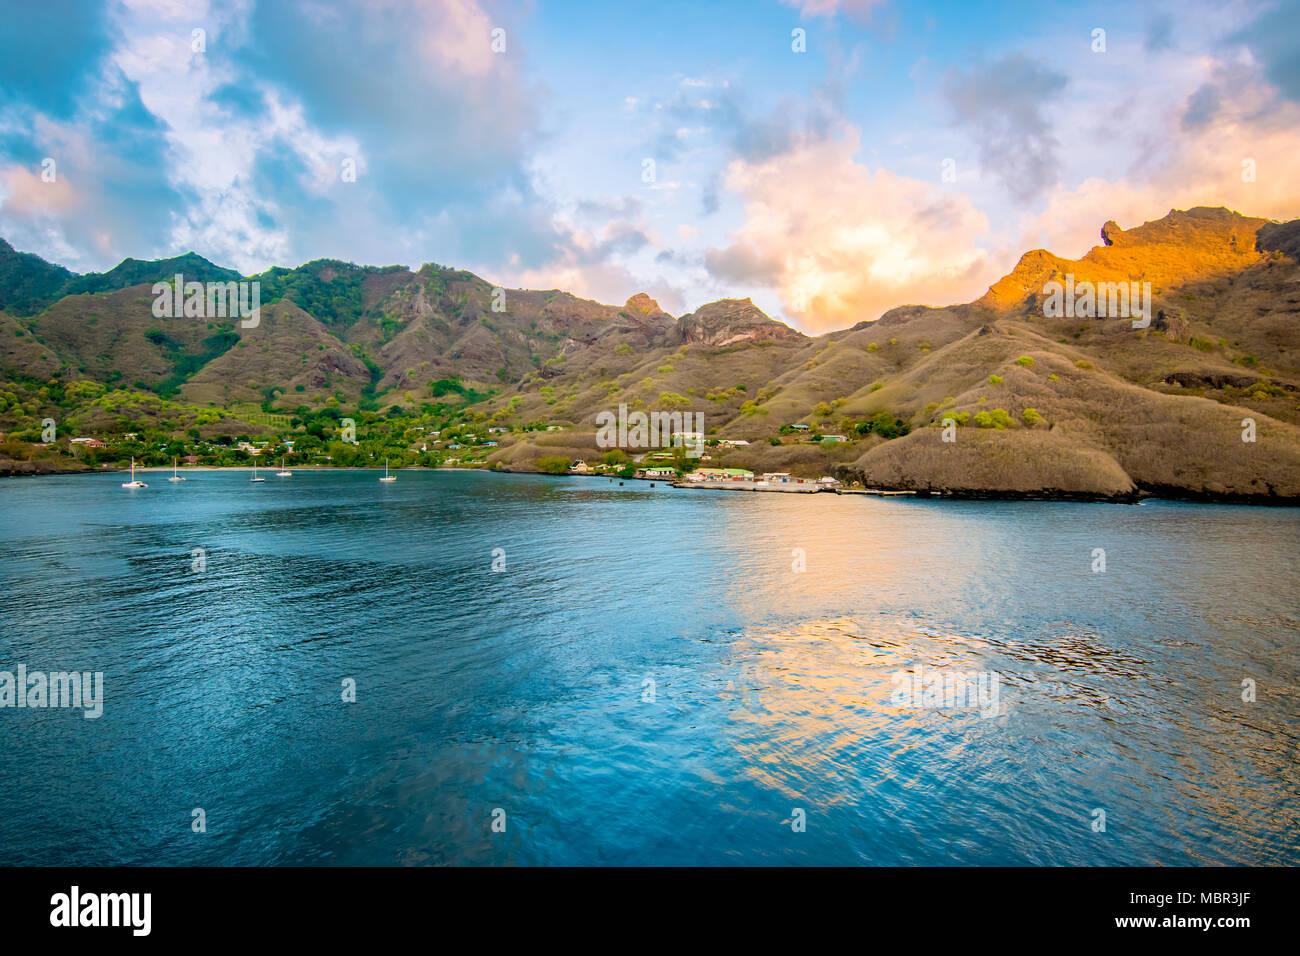 Nuku Hiva, French Polynesia. - Stock Image